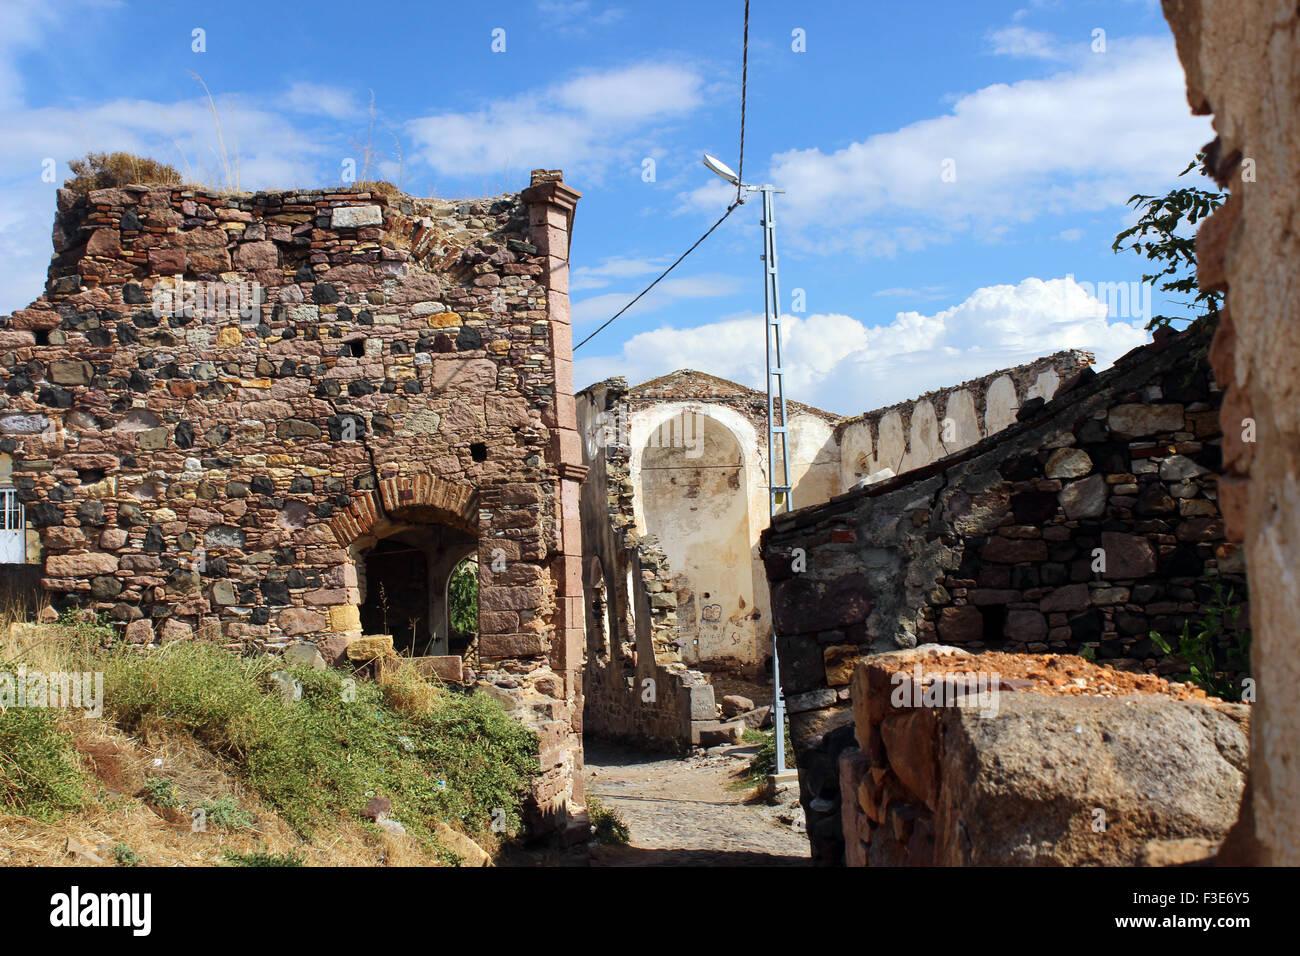 Cunda island church ruins, Balikesir, Turkey - Stock Image